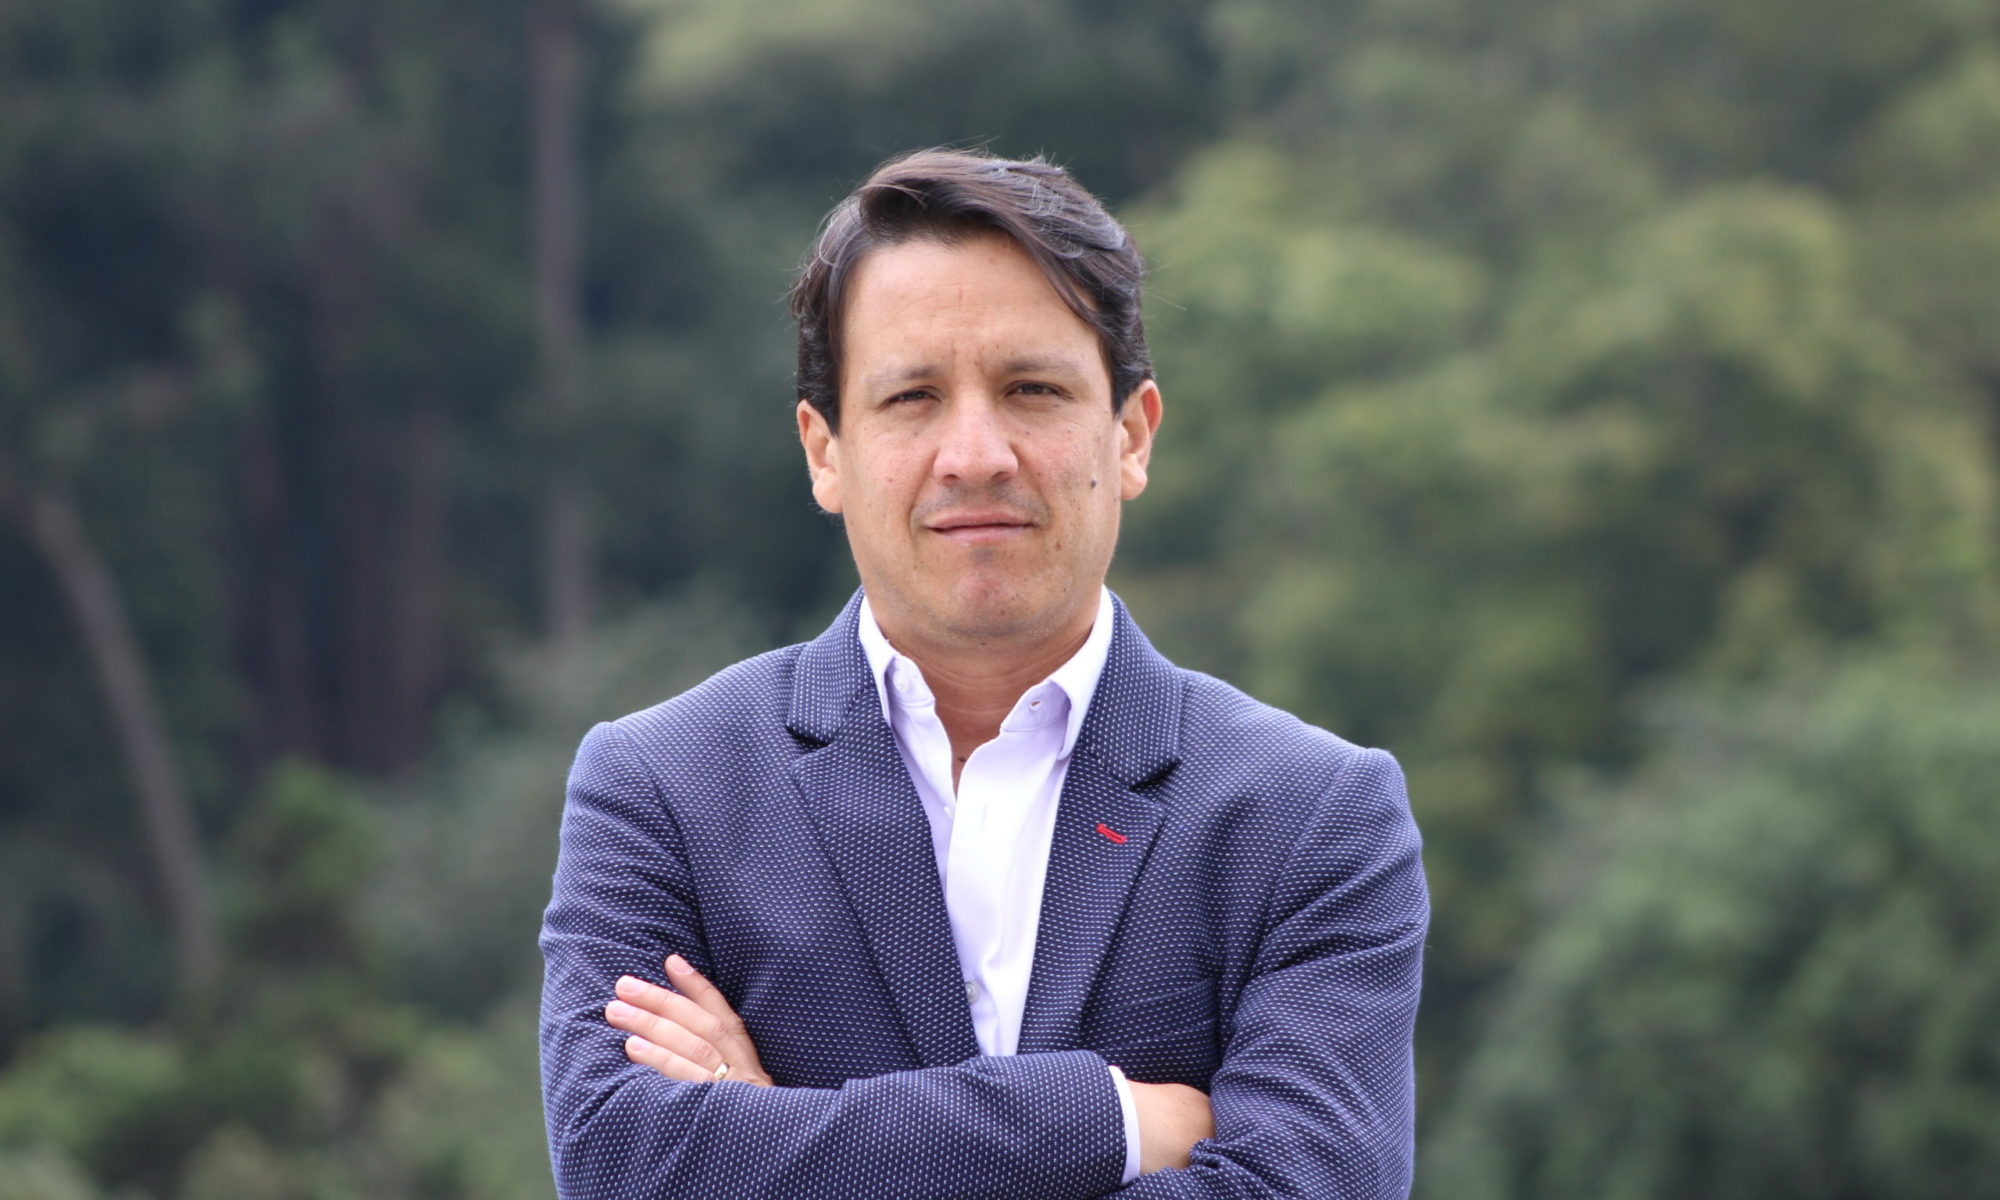 Luis A. Guzman